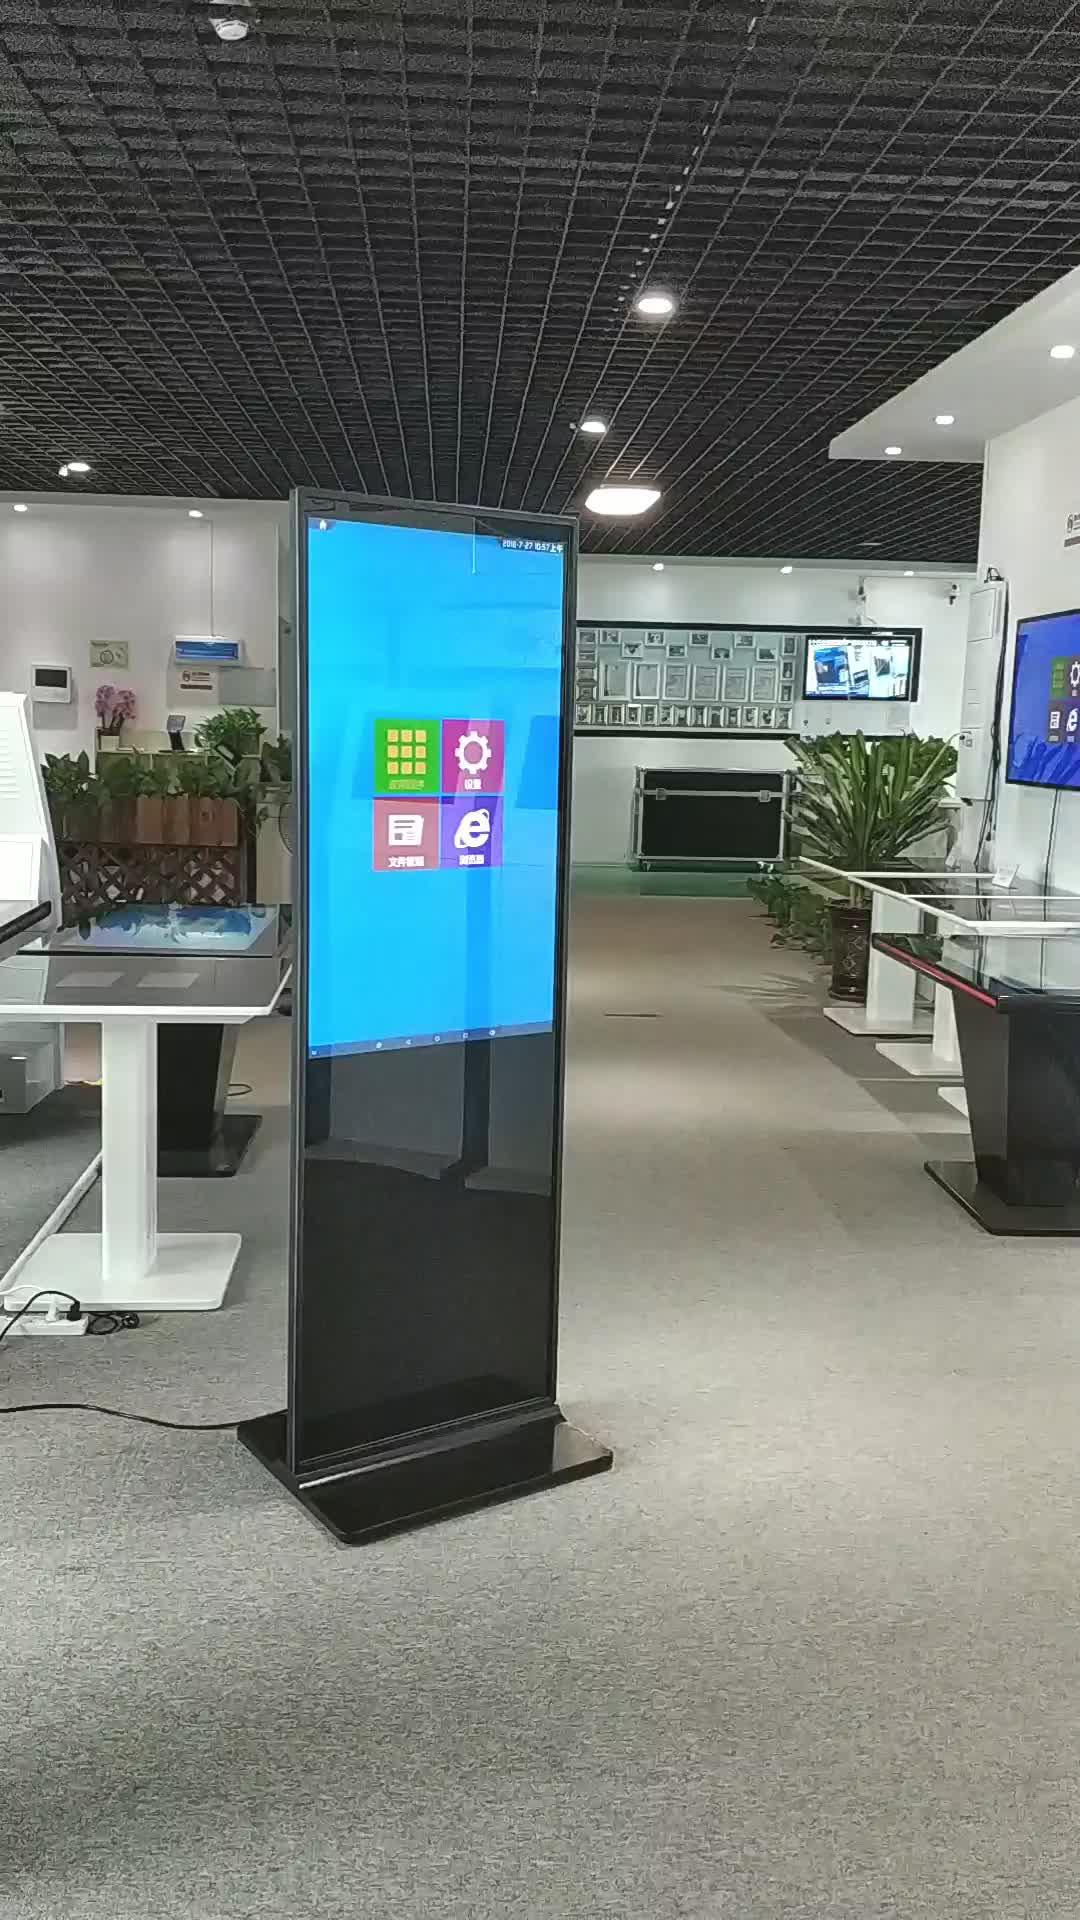 49 inch शेन्ज़ेन TFT बाजार विज्ञापन मशीन